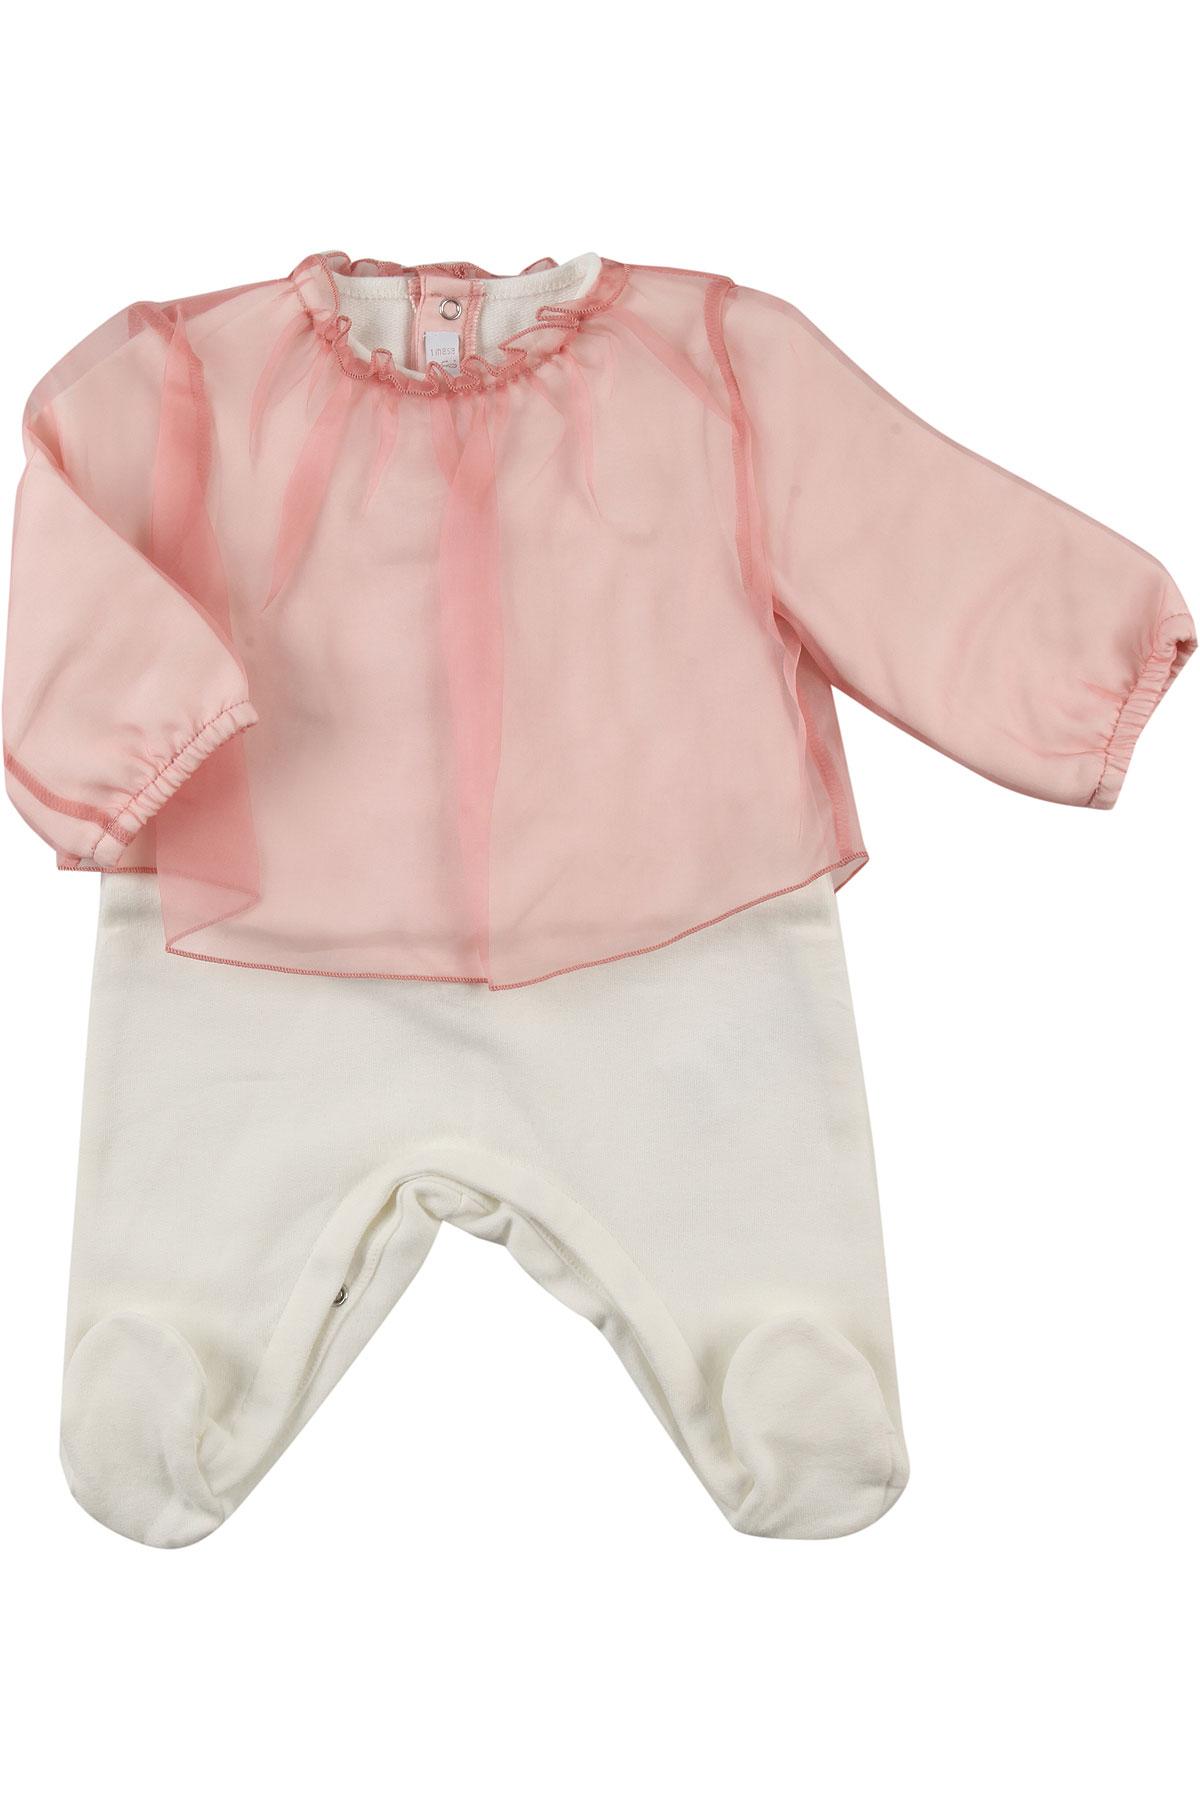 Image of Il Gufo Baby Bodysuits & Onesies for Girls, White, Silk, 2017, 1M 3M 6M